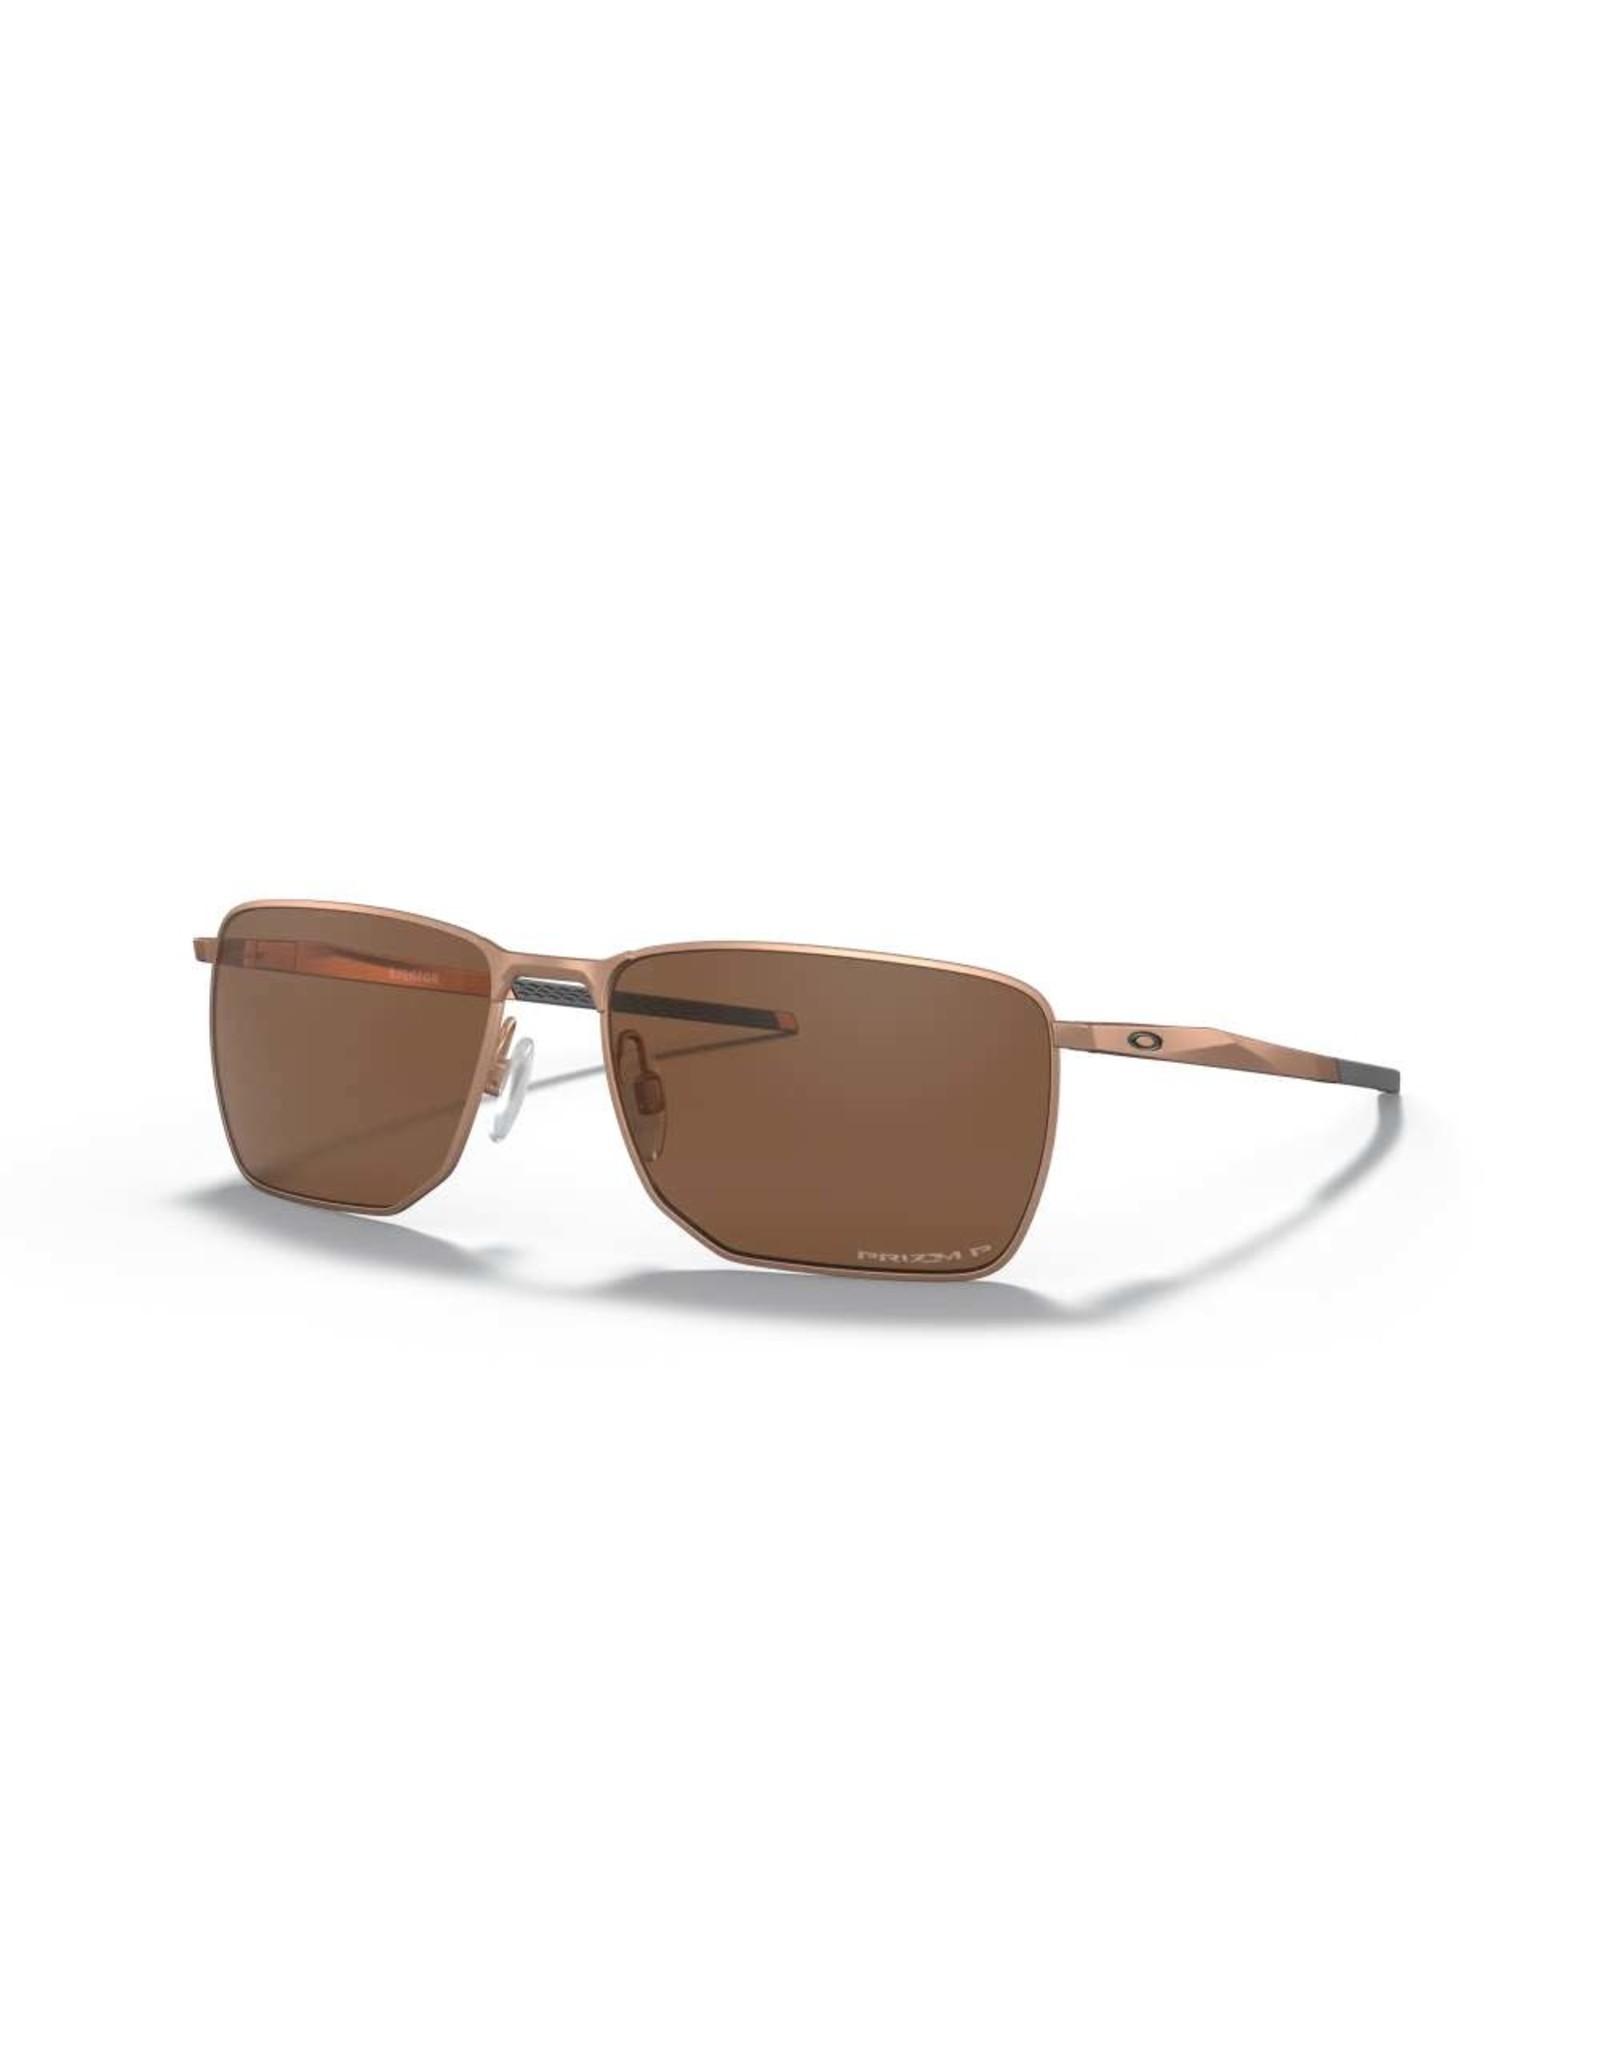 OAKLEY Oakley Ejector satin rose gold w prizm tungsten polarised sunglasses